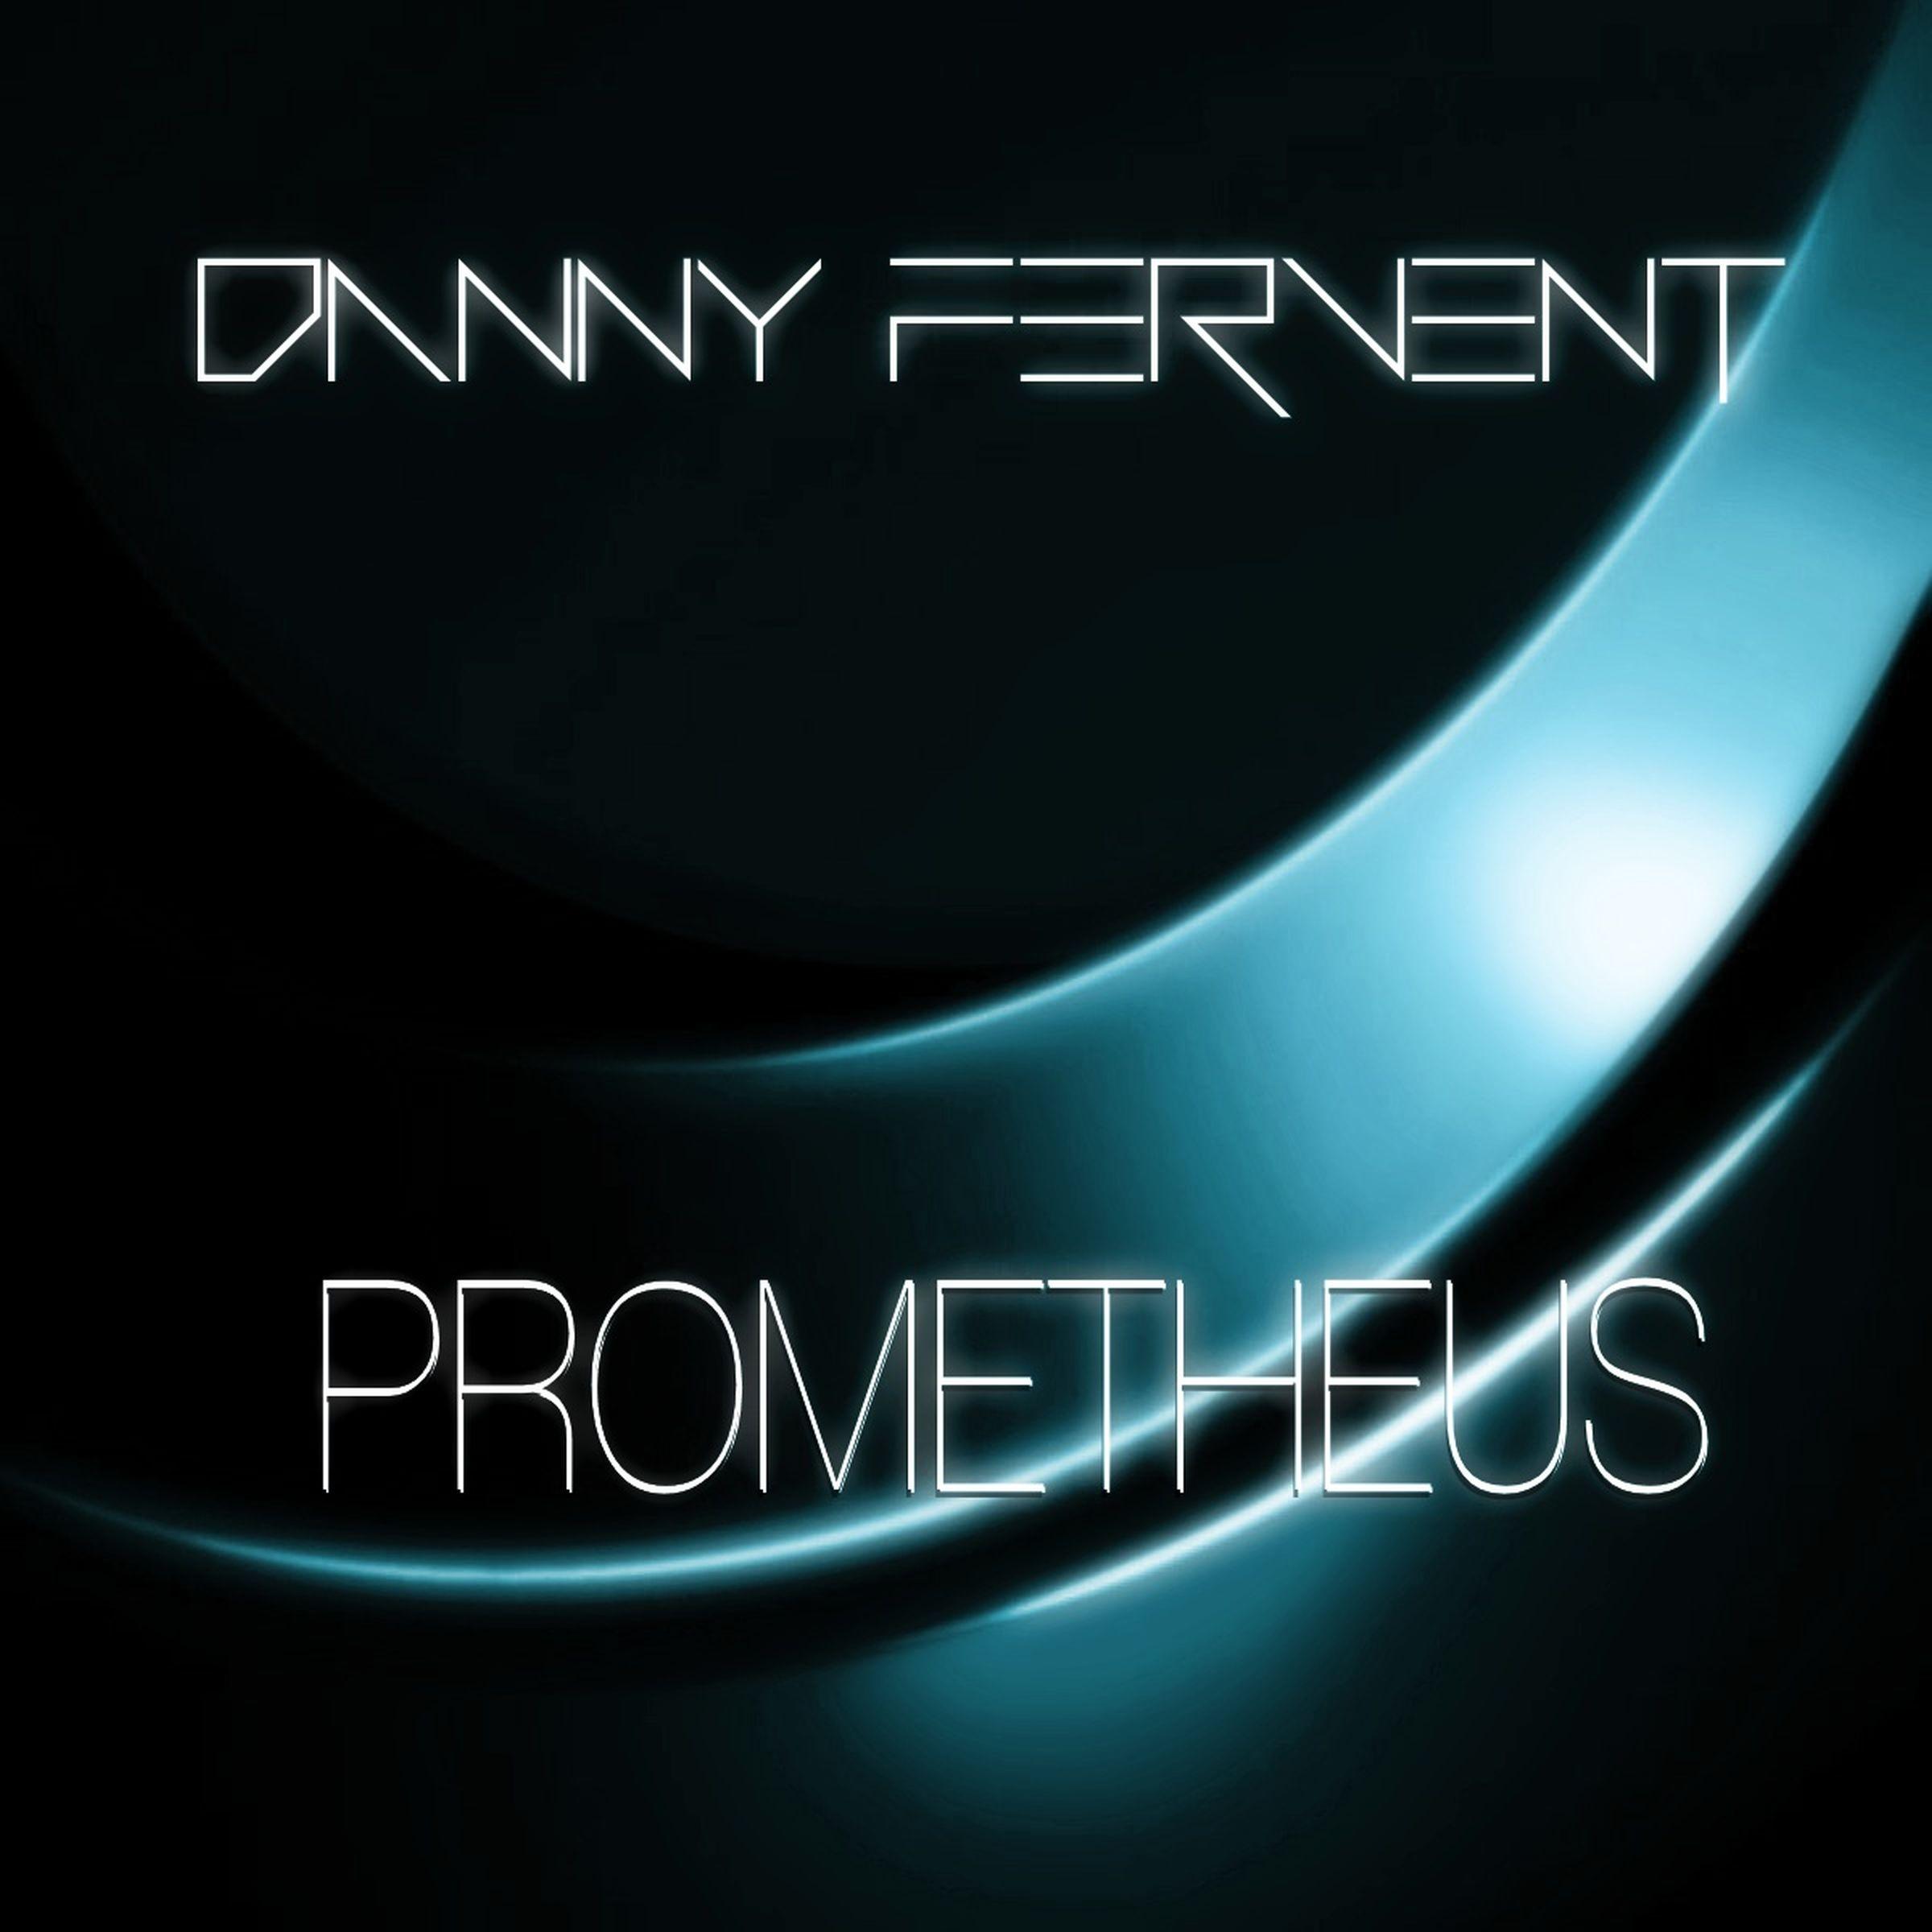 Danny Fervent - Prometheus (Sunrise Mix)